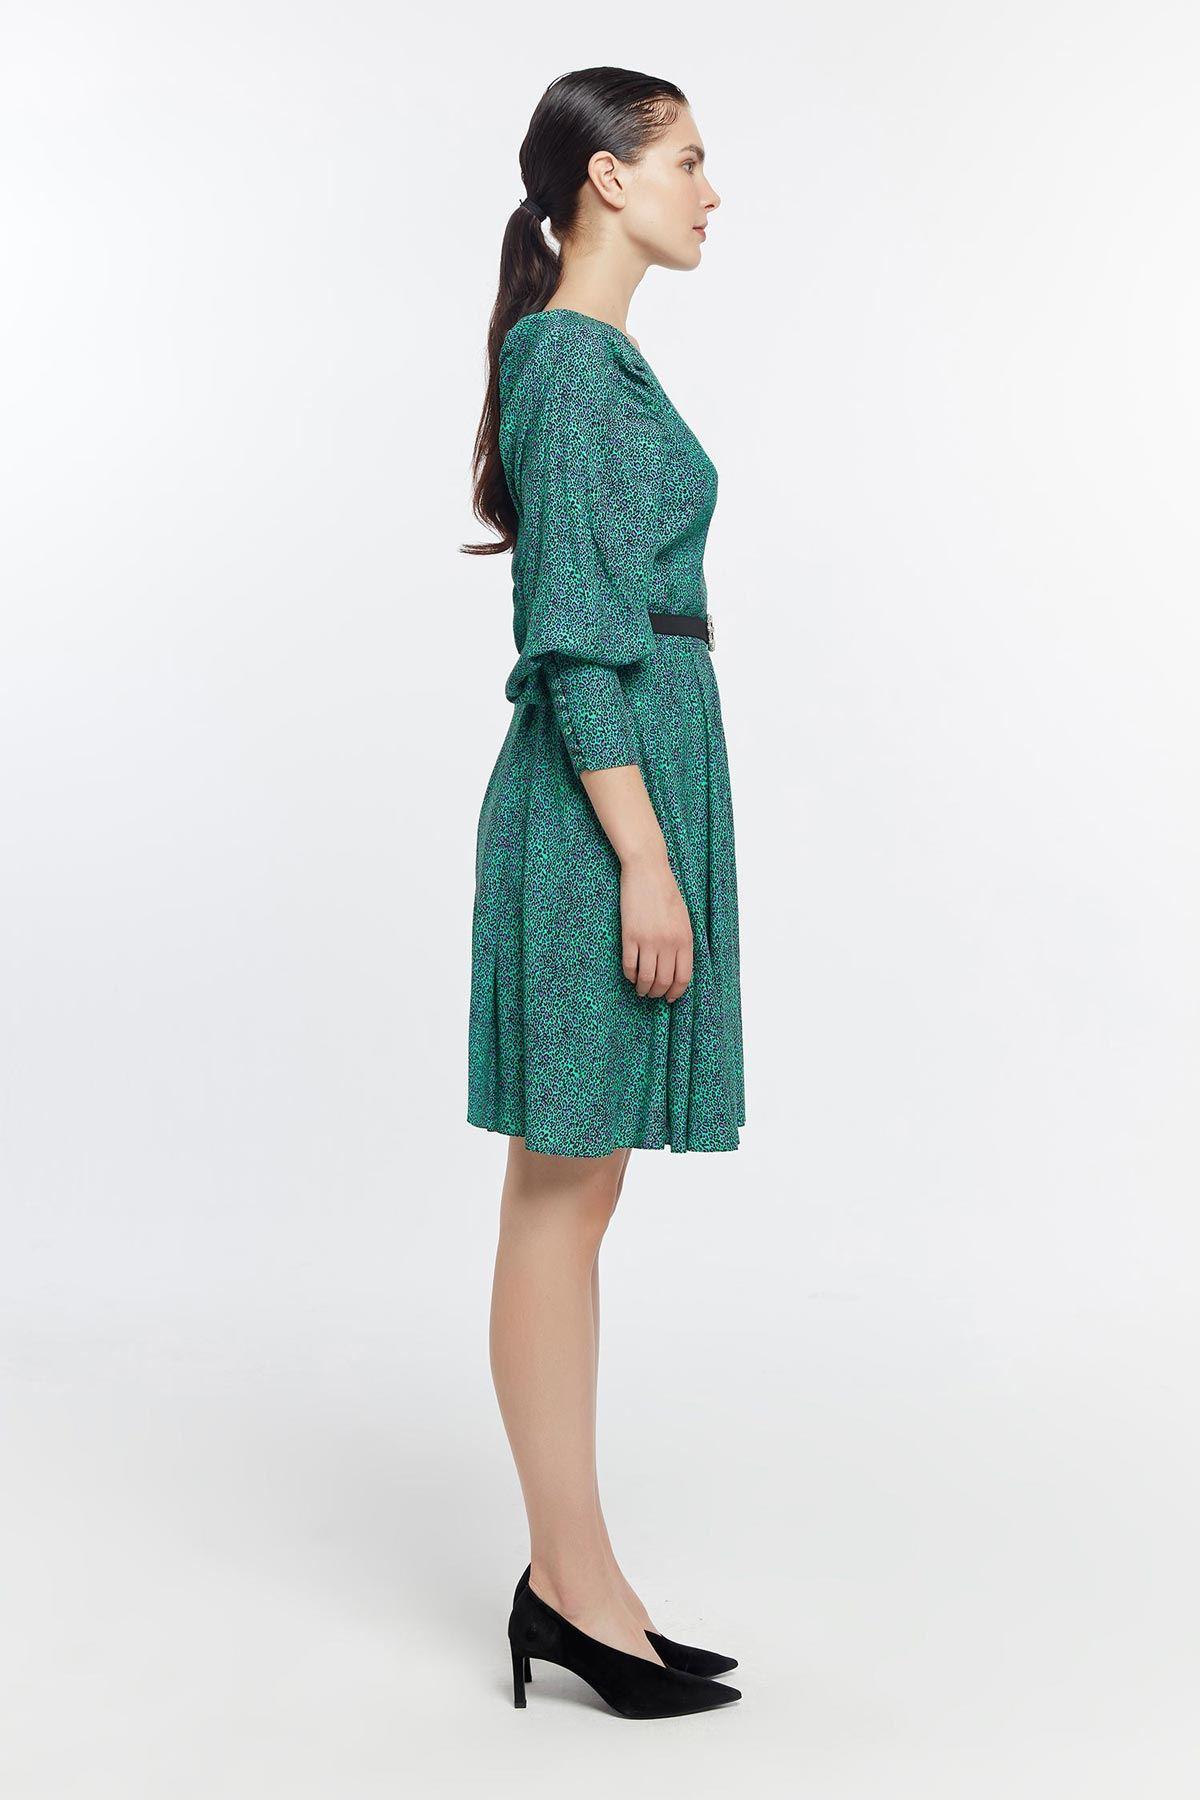 Balon kol leopar desenli elbise Yeşil